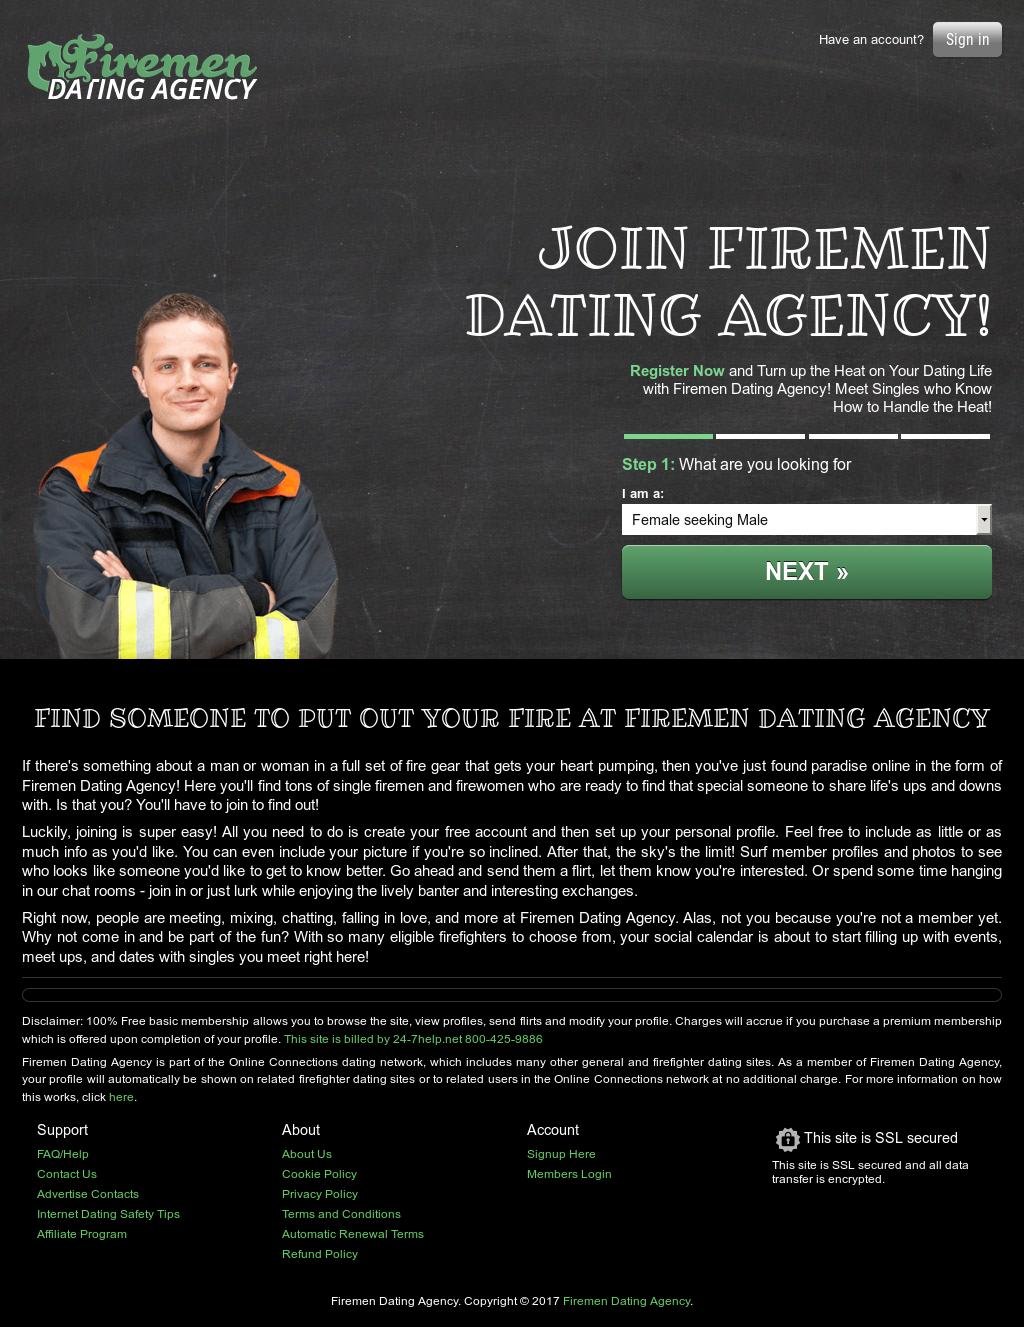 dating agency.com login